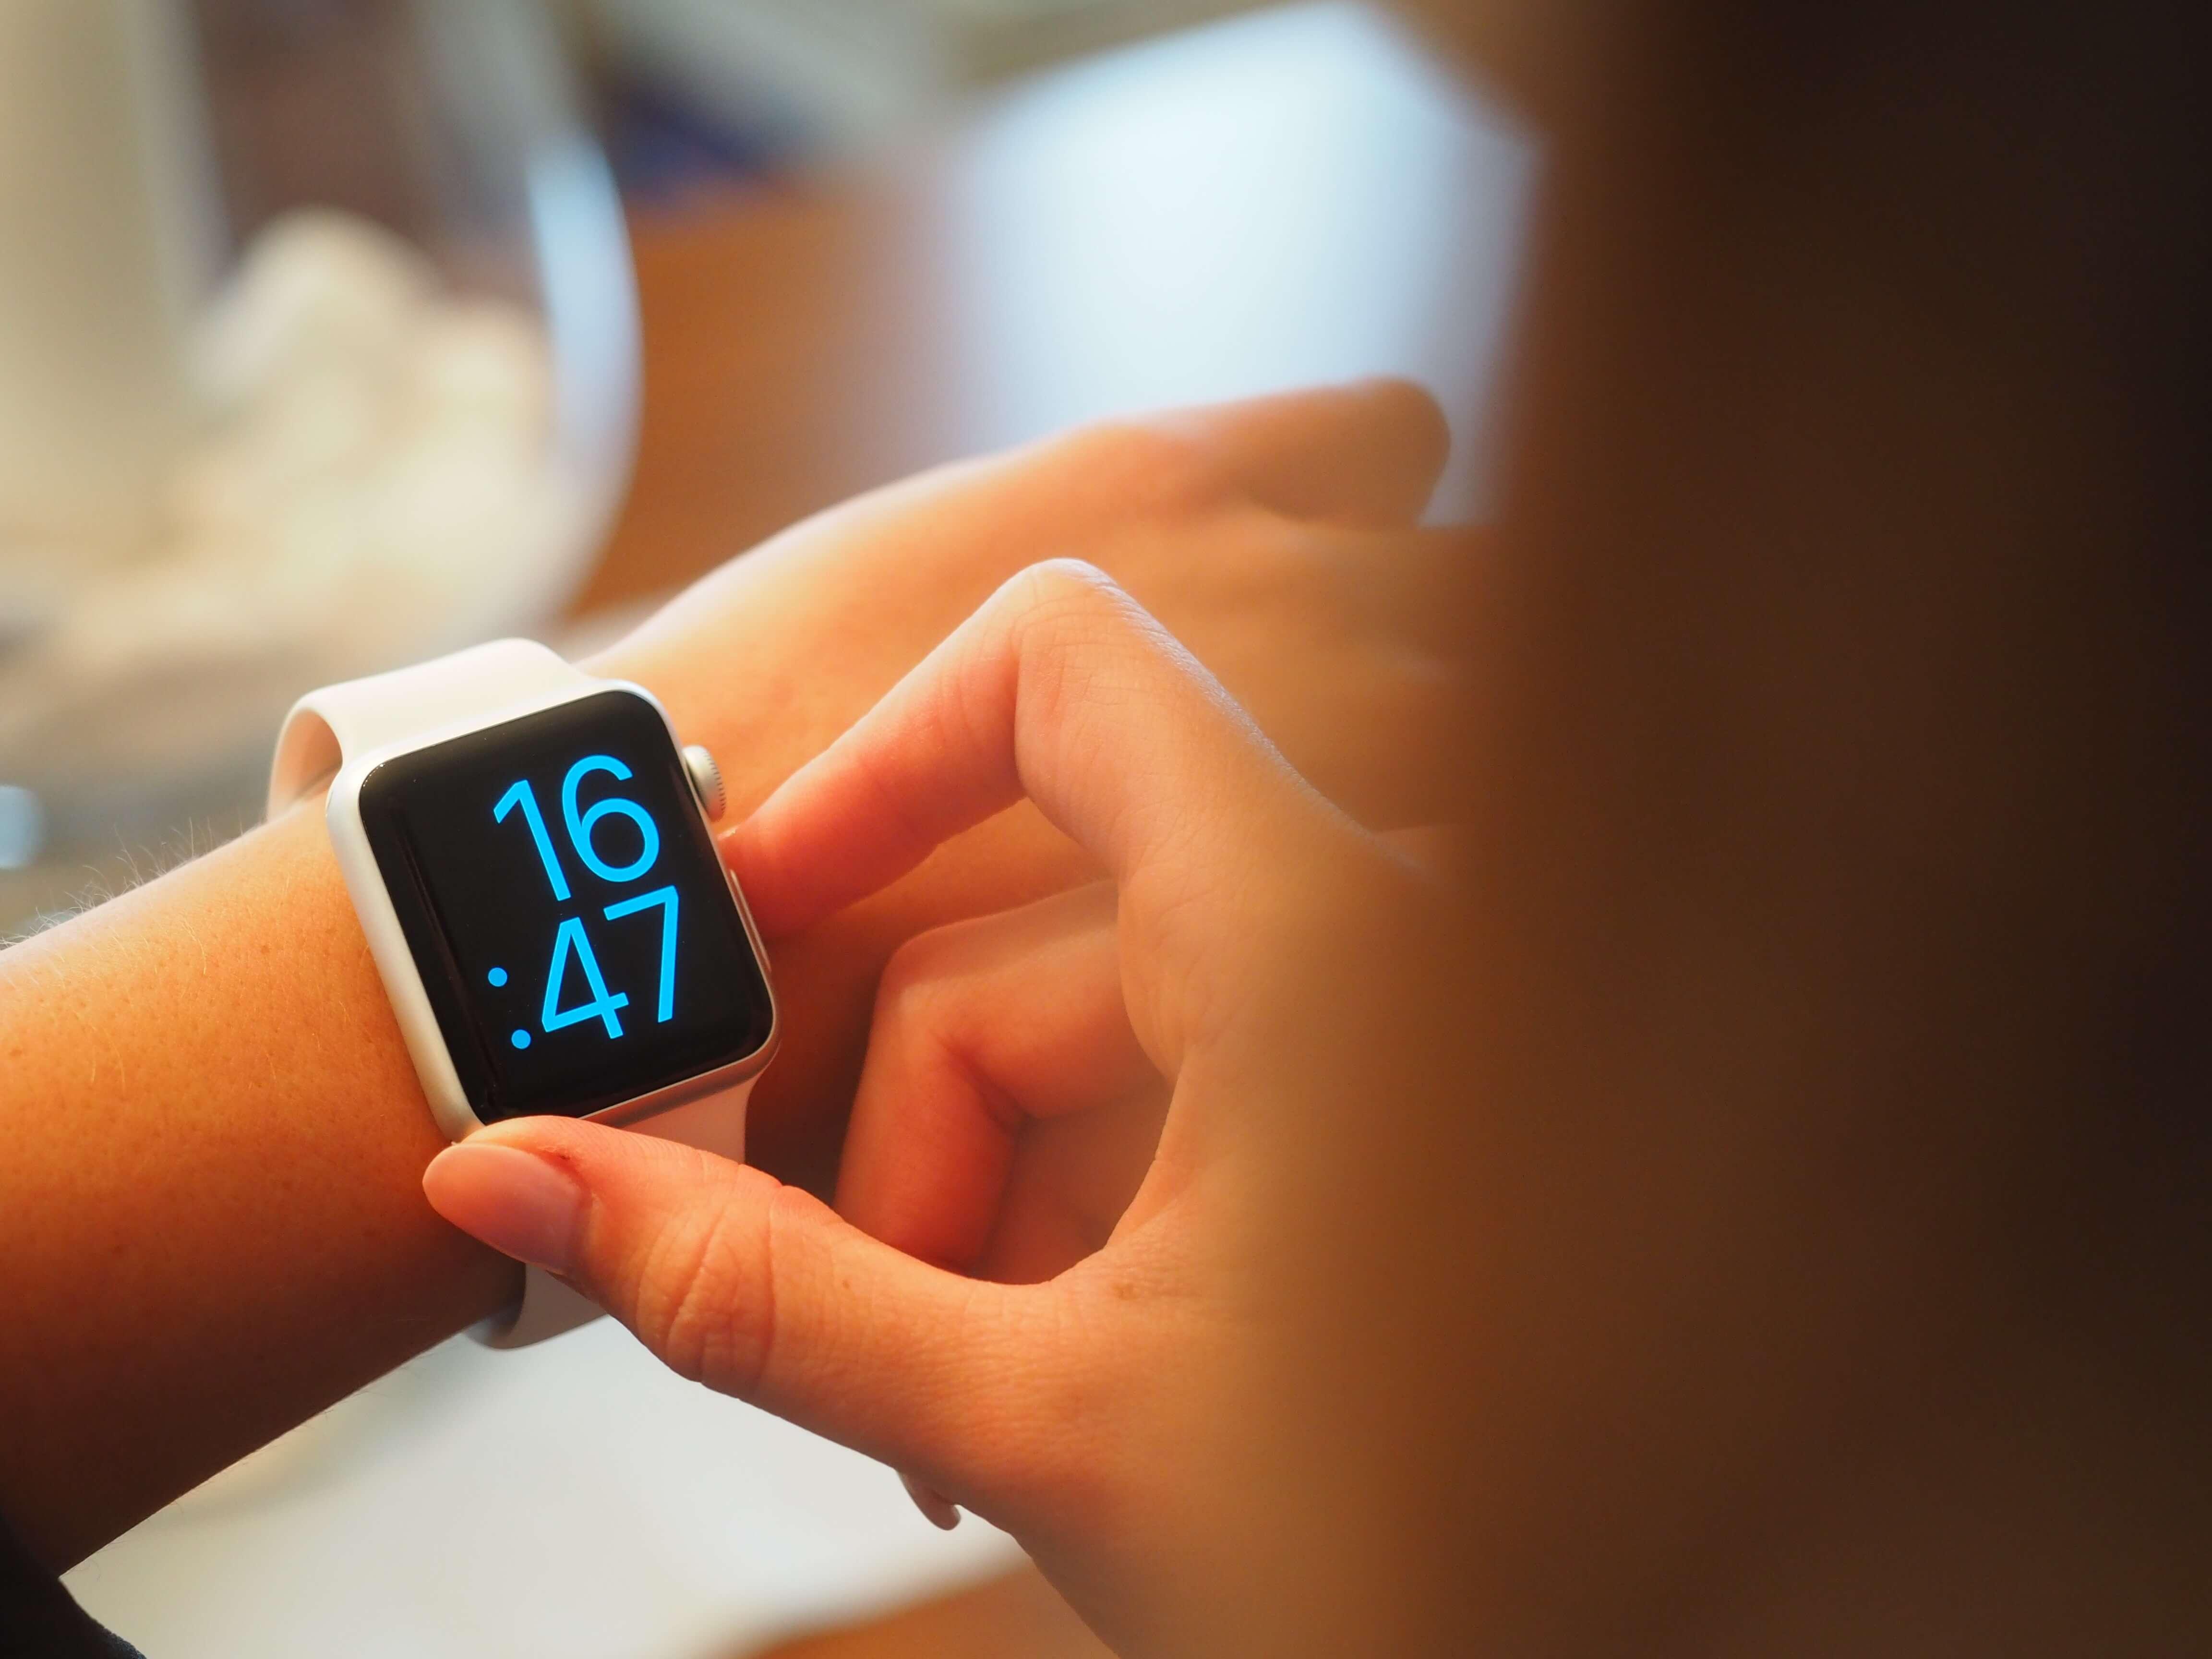 digital-hand-smartwatch-110471